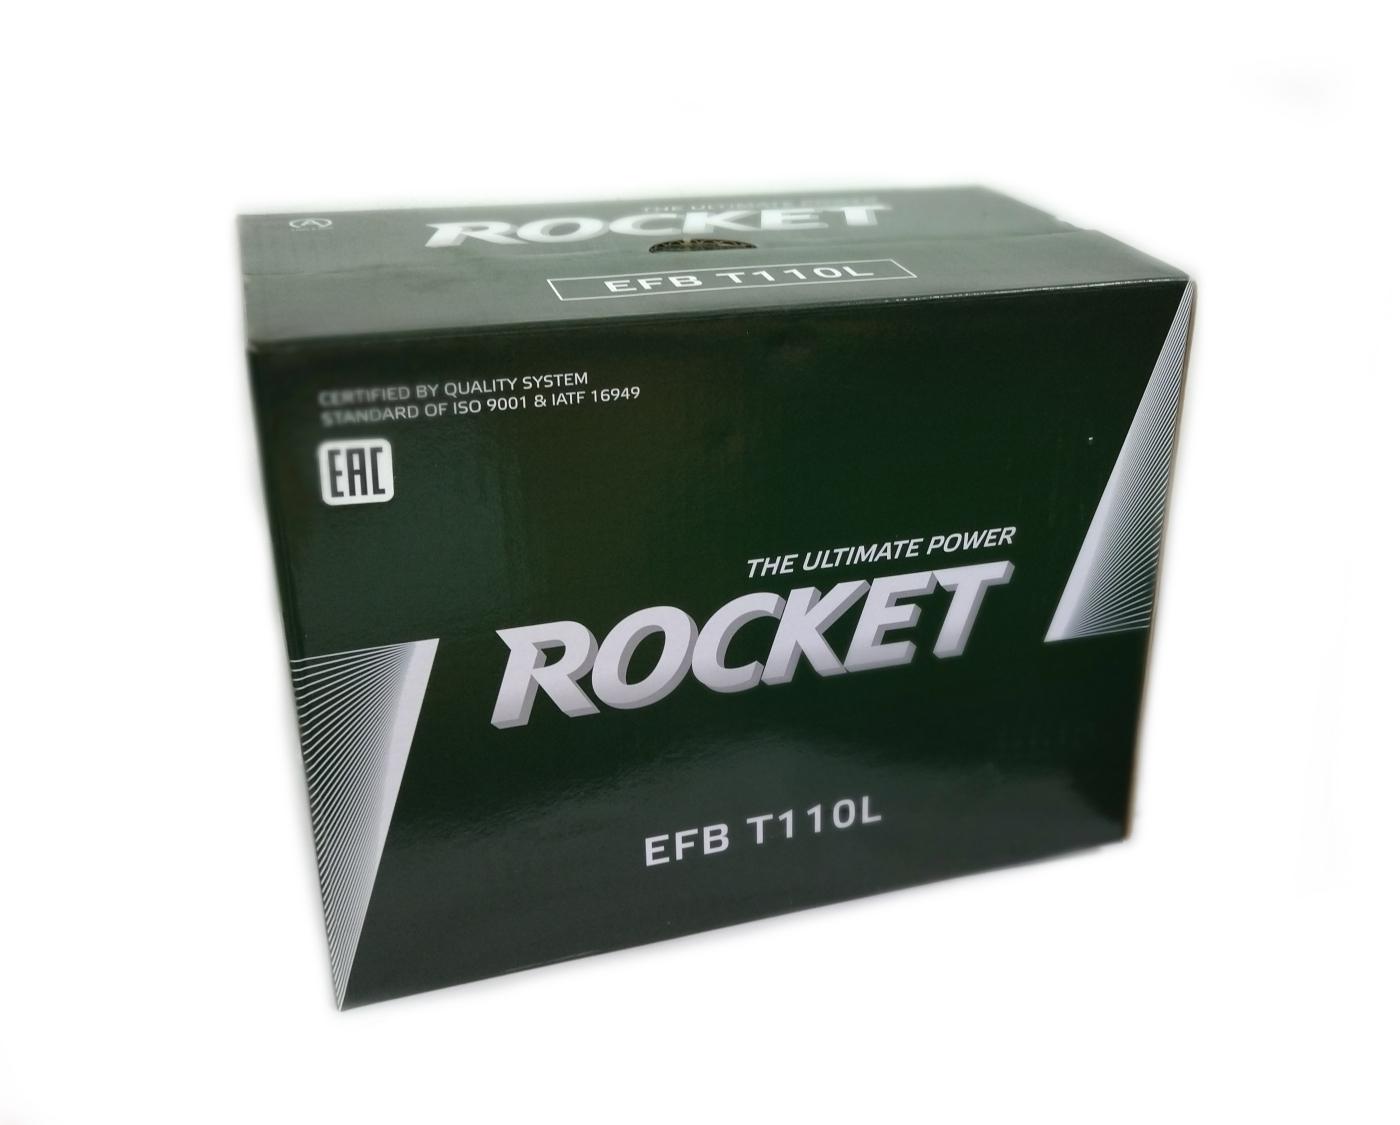 Rocket EFB T110